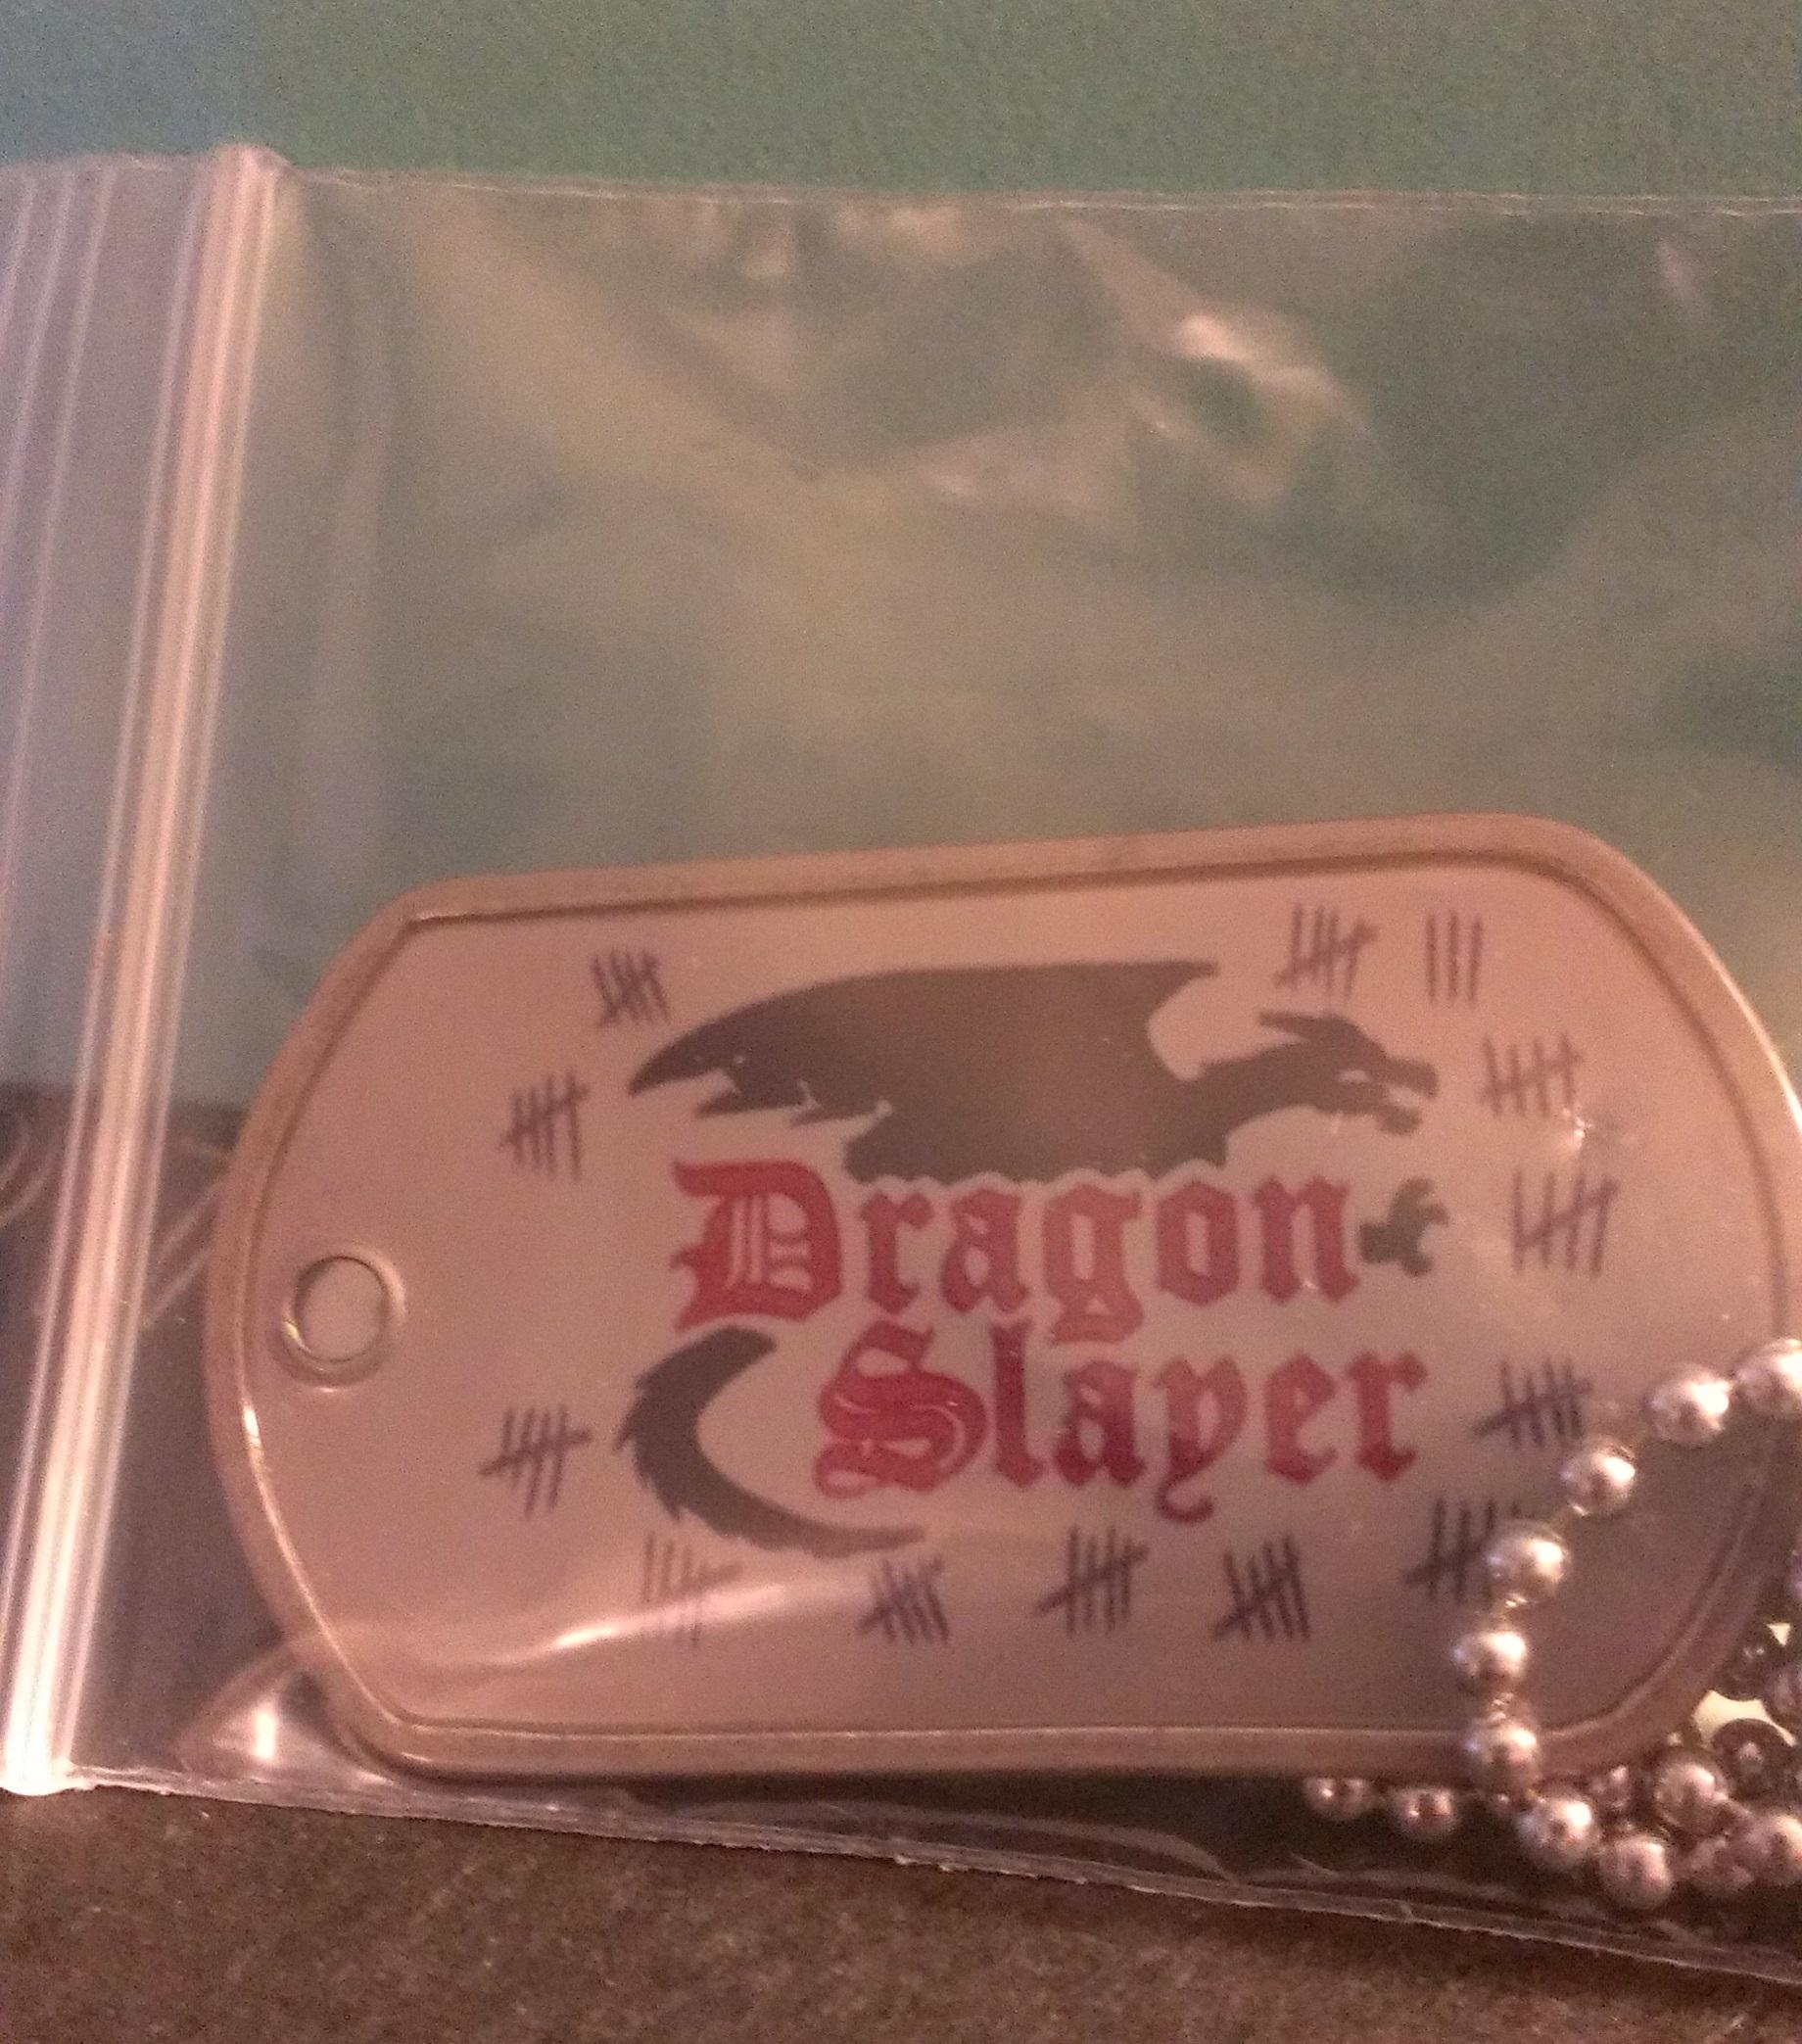 DragonTag